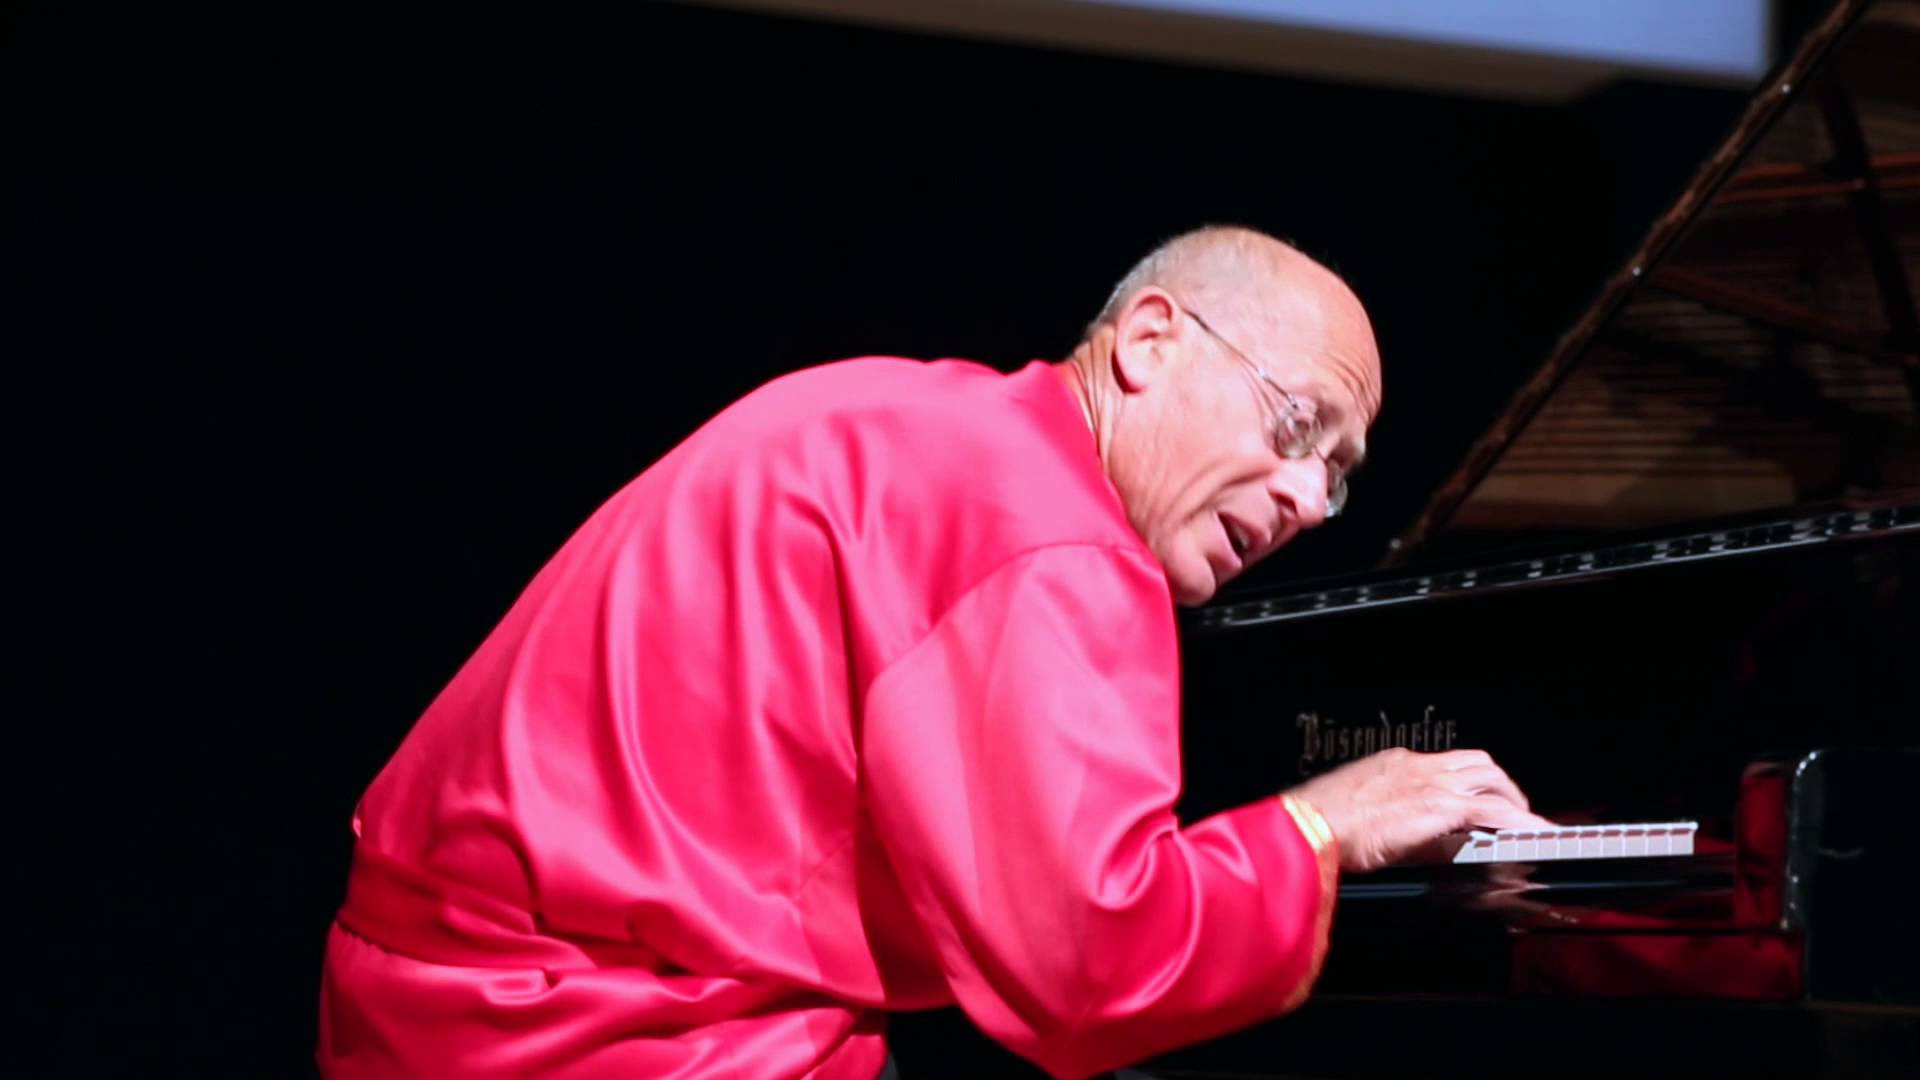 Shine again: David Helfgott is back after 20 years